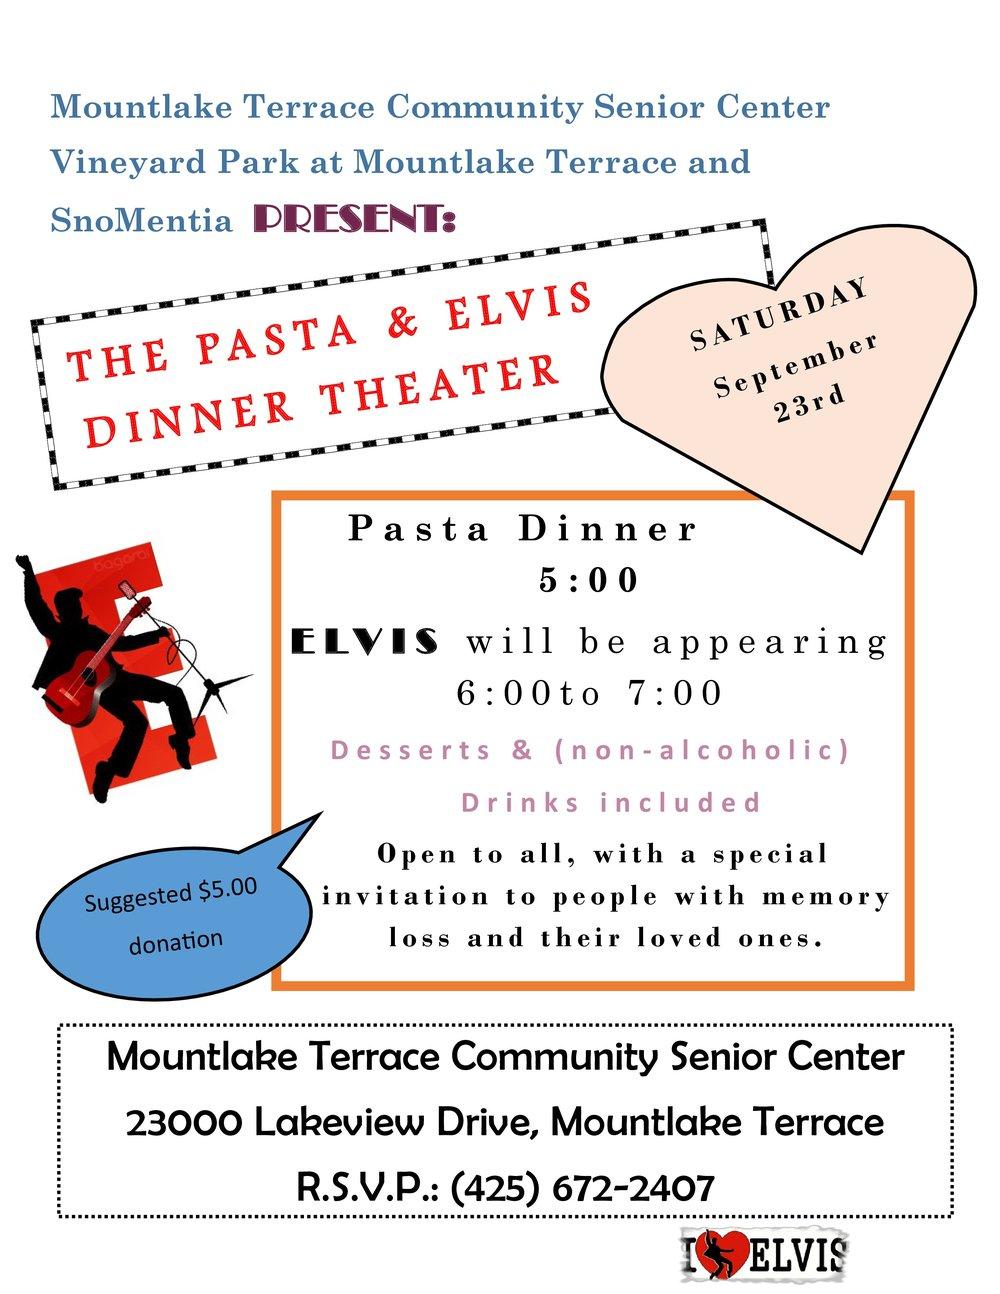 Pasta & Elvis Dinner Theater-page-0.jpg